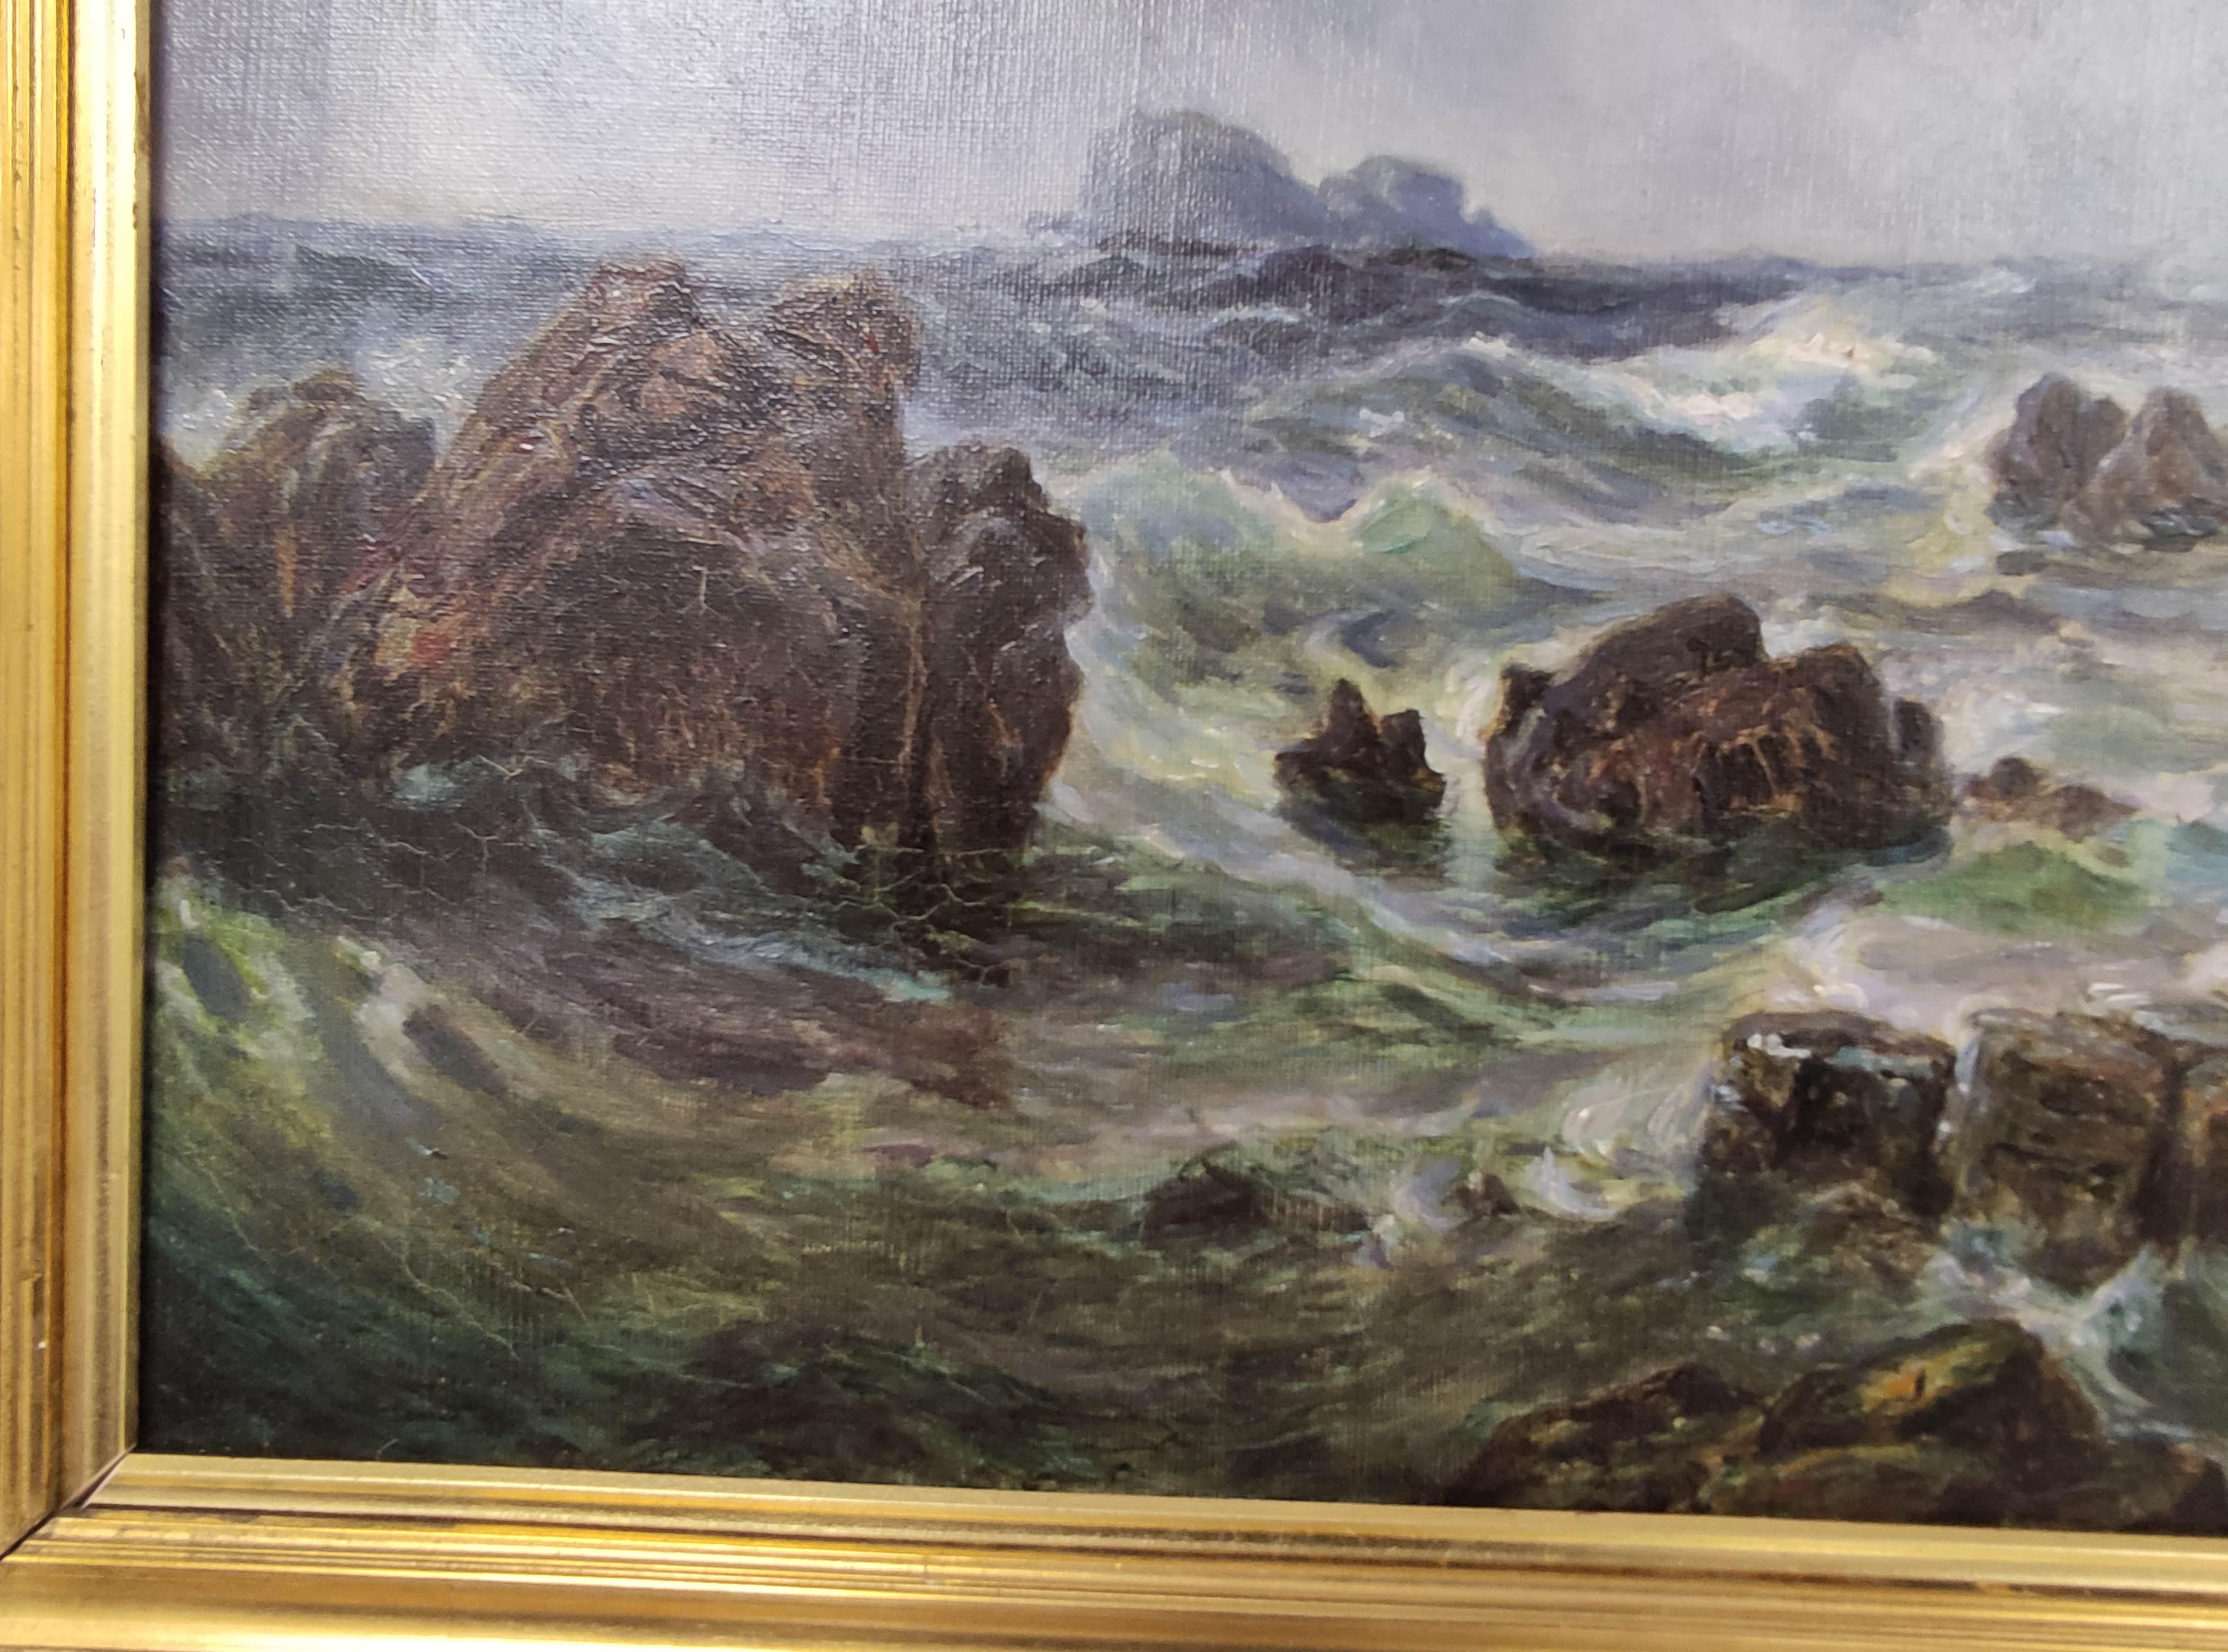 SCOTTISH SCHOOL C.1800. Fingals Cave, Staffa. Oil on canvas. 58cm x 88cm. - Image 4 of 4